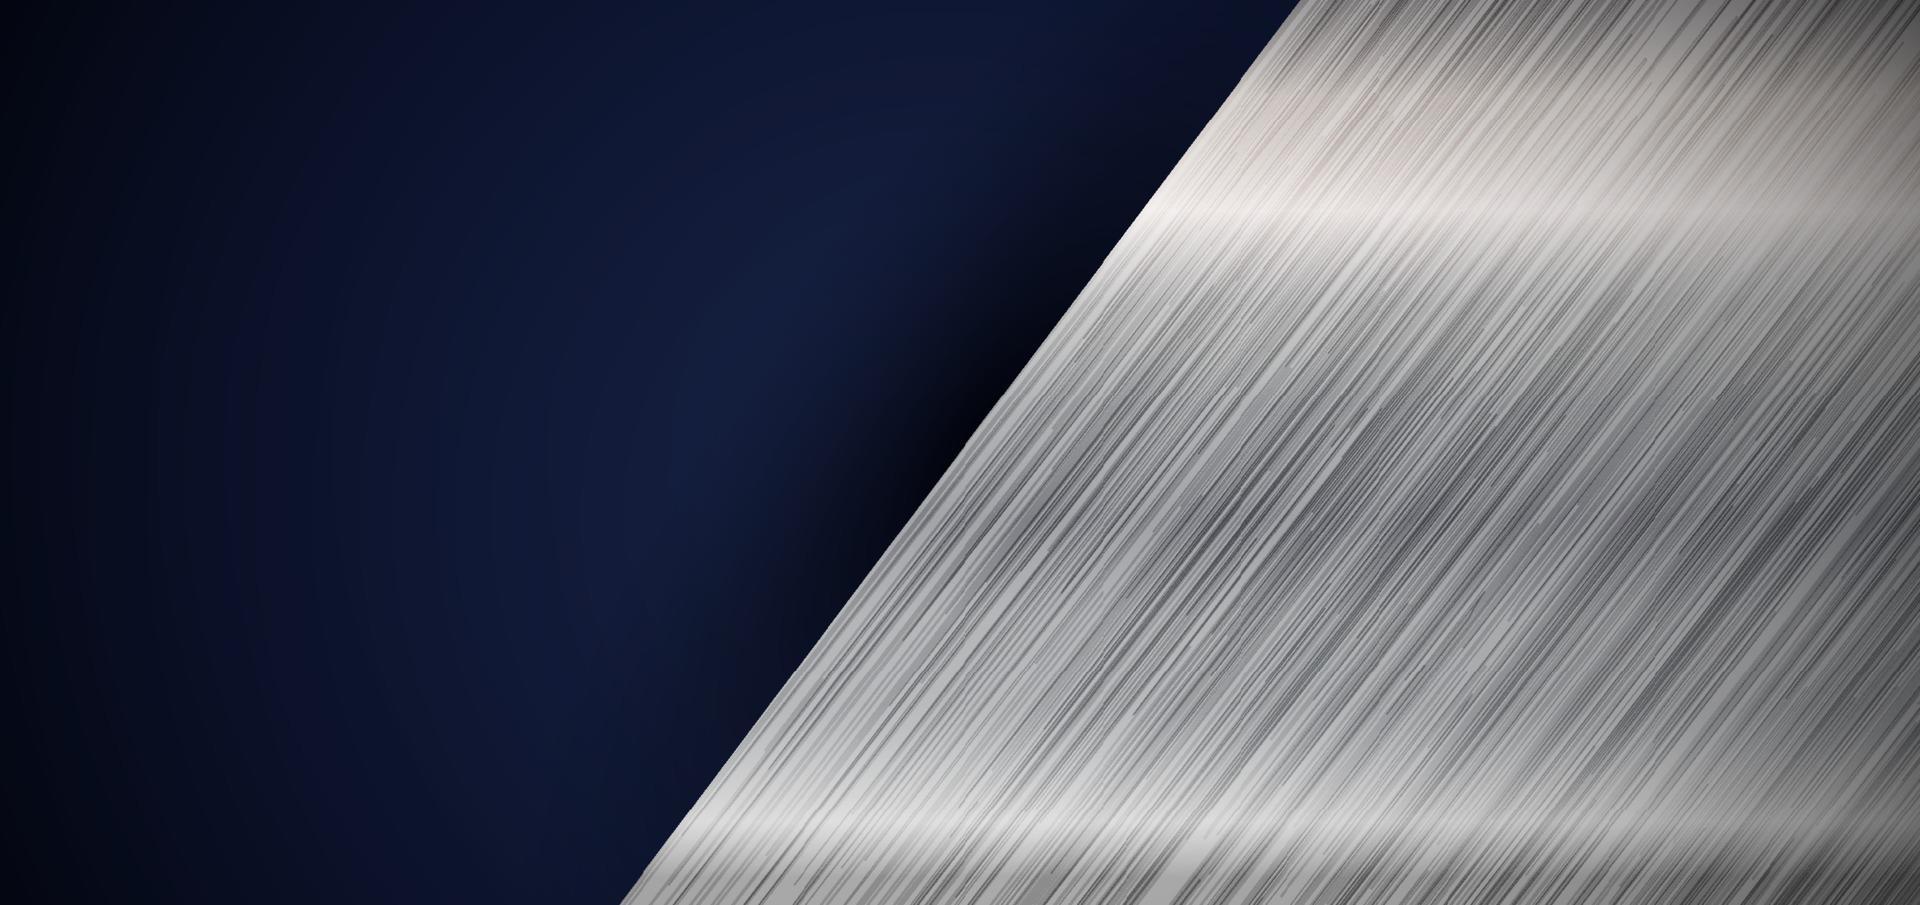 Abstract banner web elegant silver metallic diagonal on dark blue background vector